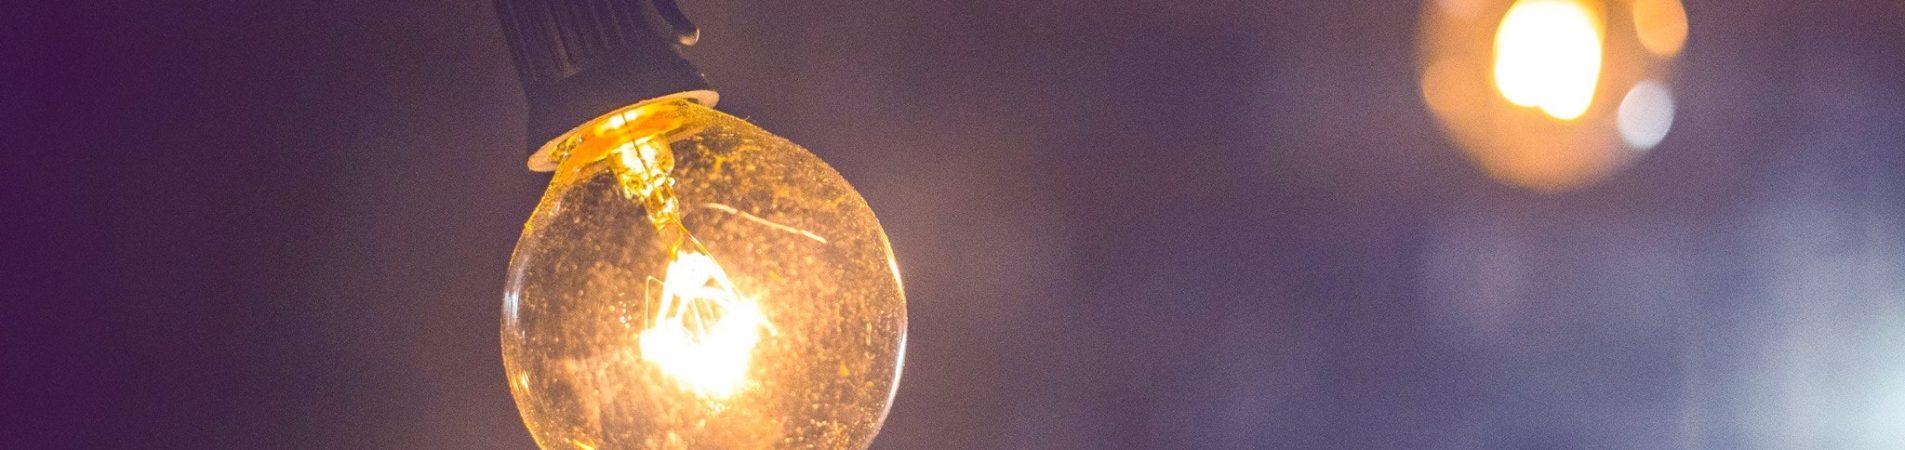 LED's kopen - Deboled LED verlichting